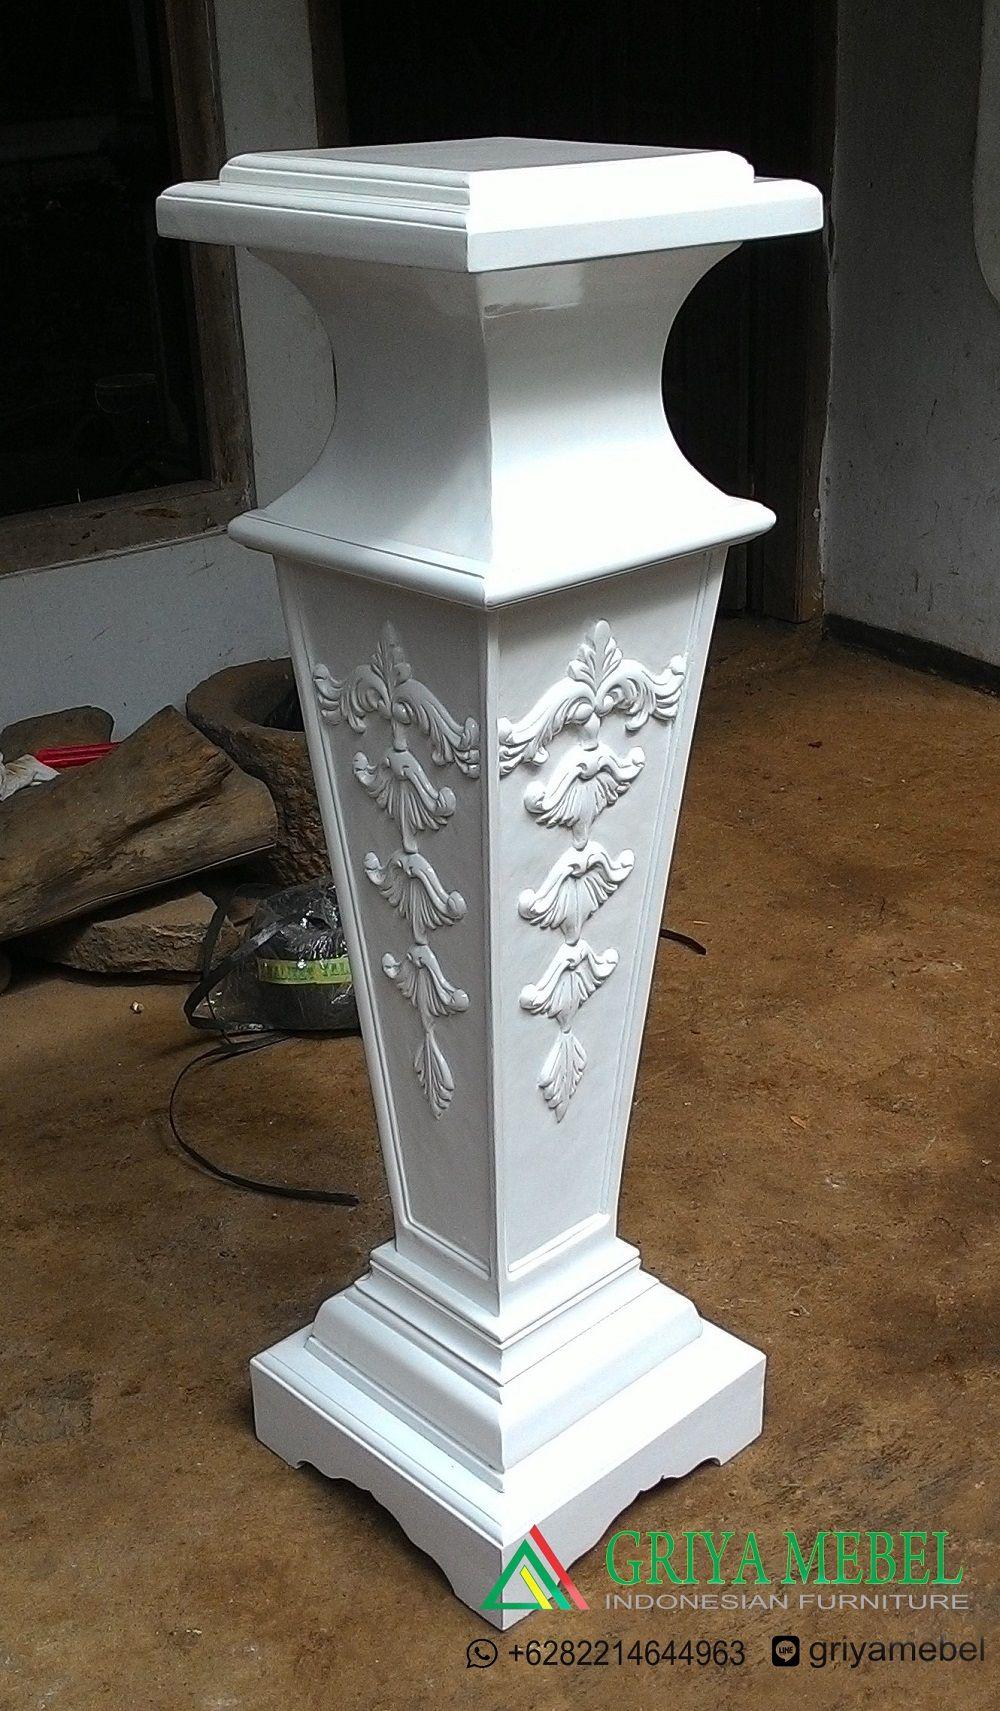 griyamebel.com product standing-flower-cube-duco-putih